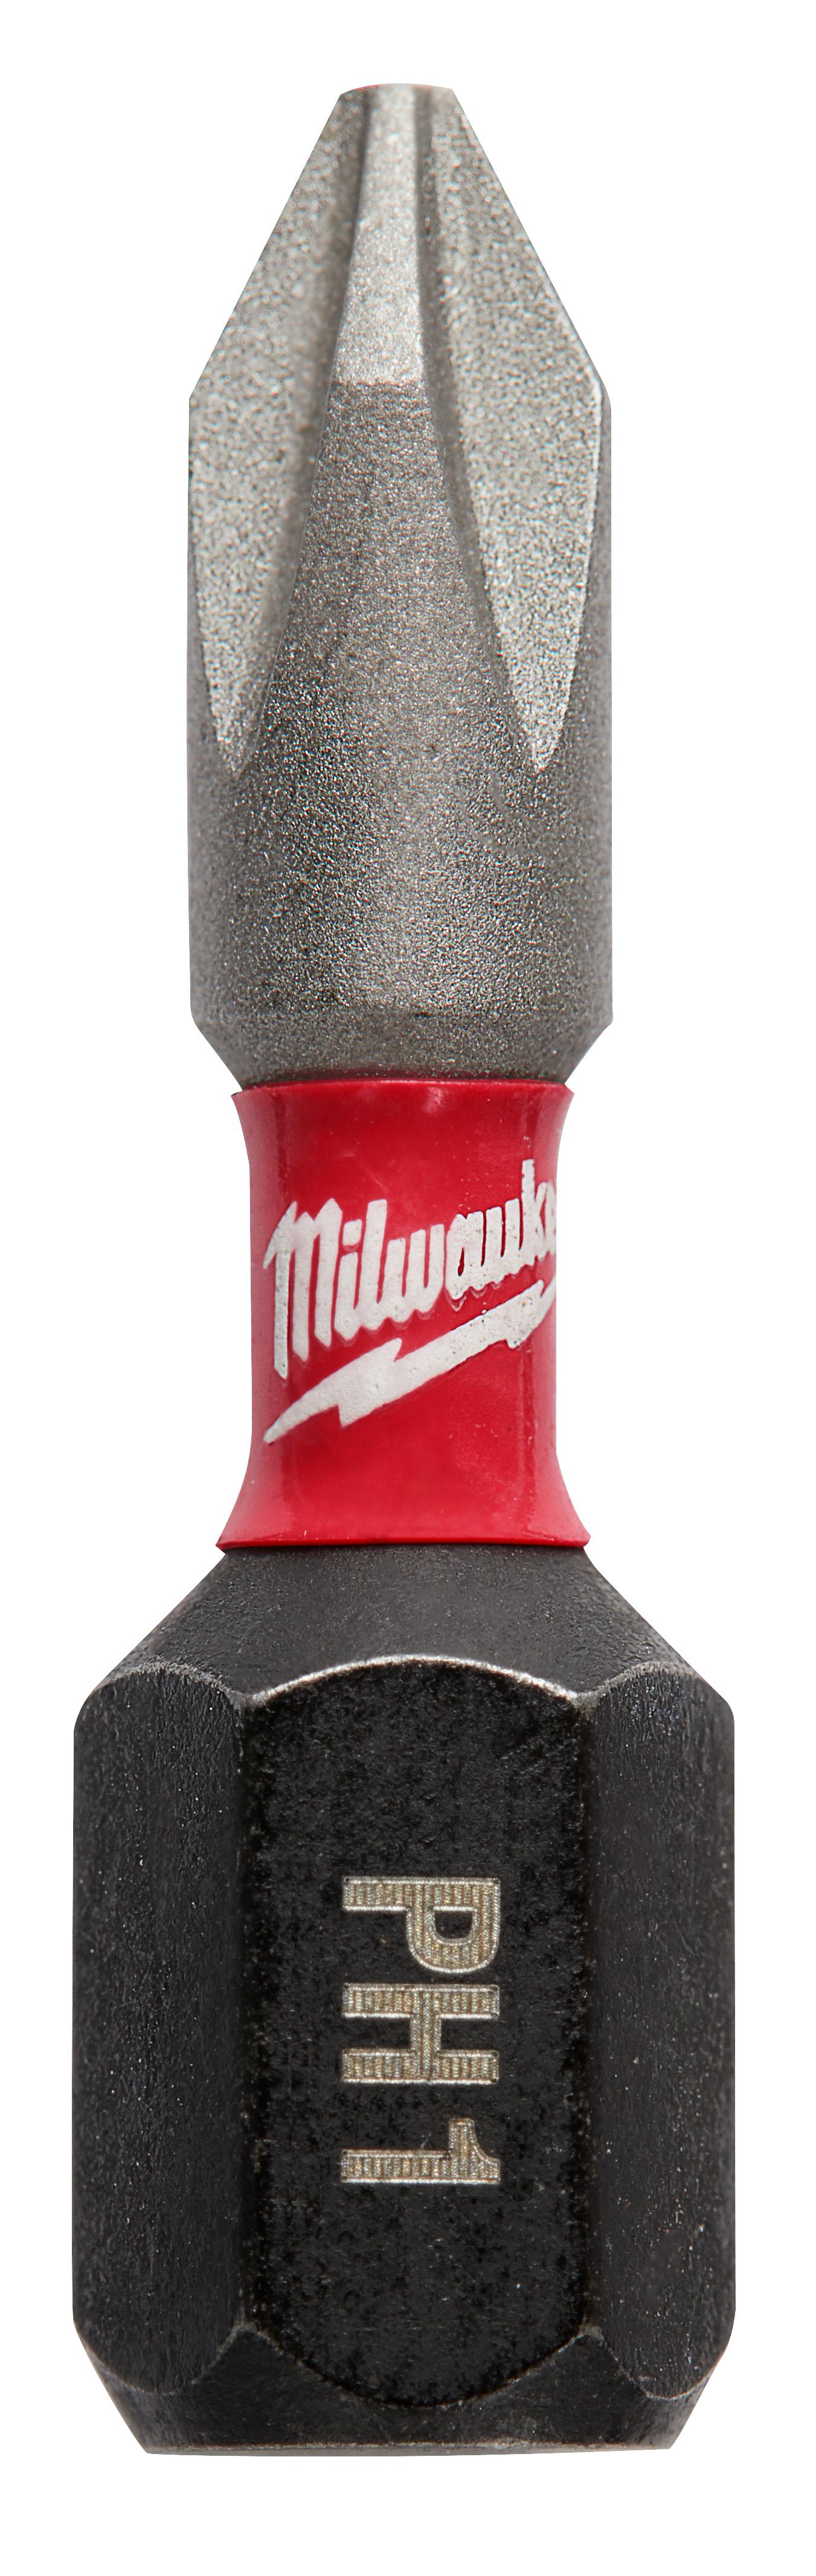 Milwaukee® SHOCKWAVE™ 48-32-4880 Impact Insert Bit, #1 Phillips® Point, 1/4 in, Steel